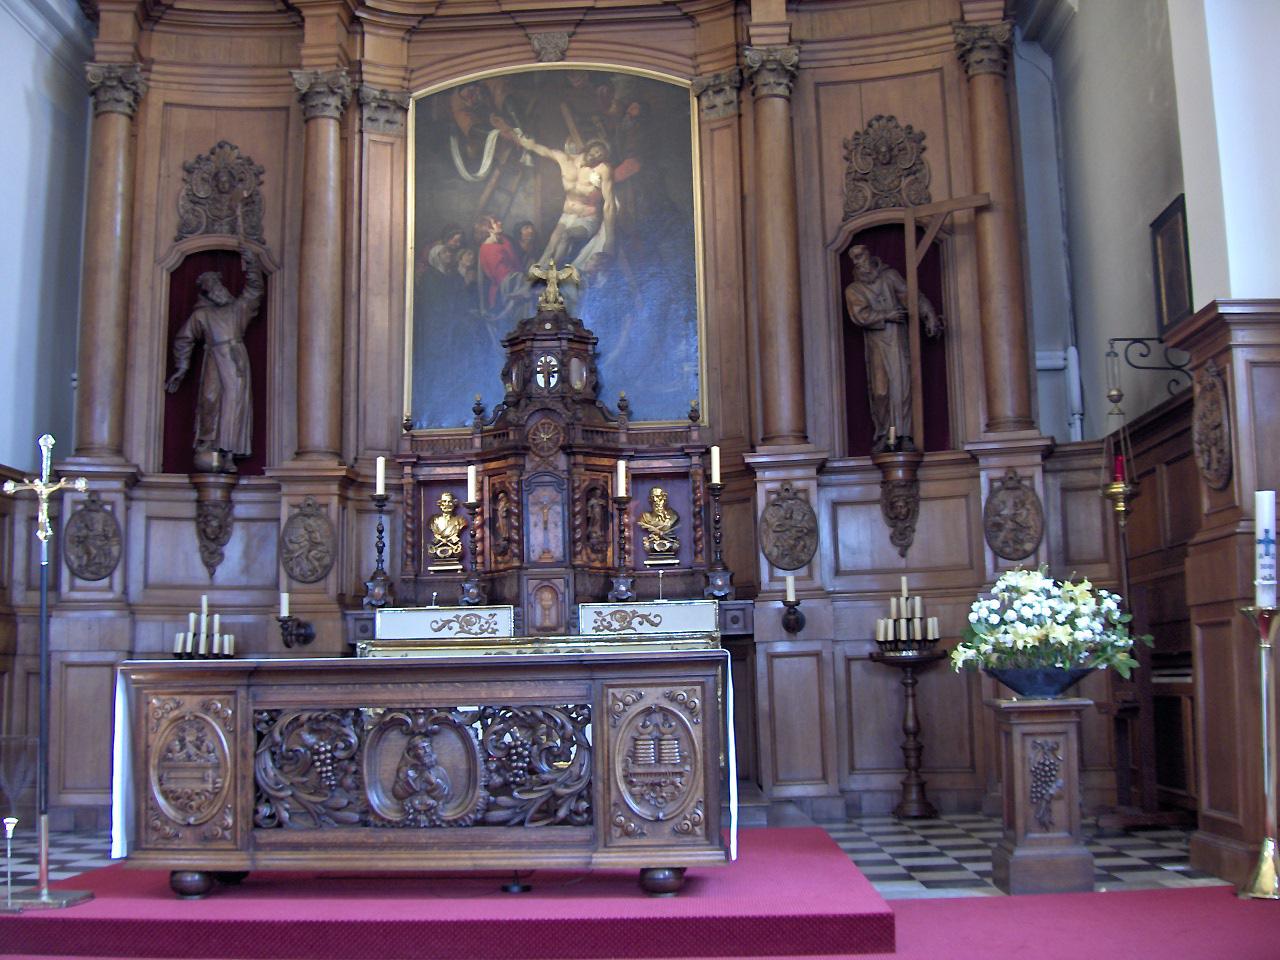 Picture of high altar from Kapucijnenkerk in Ostend, Belgium